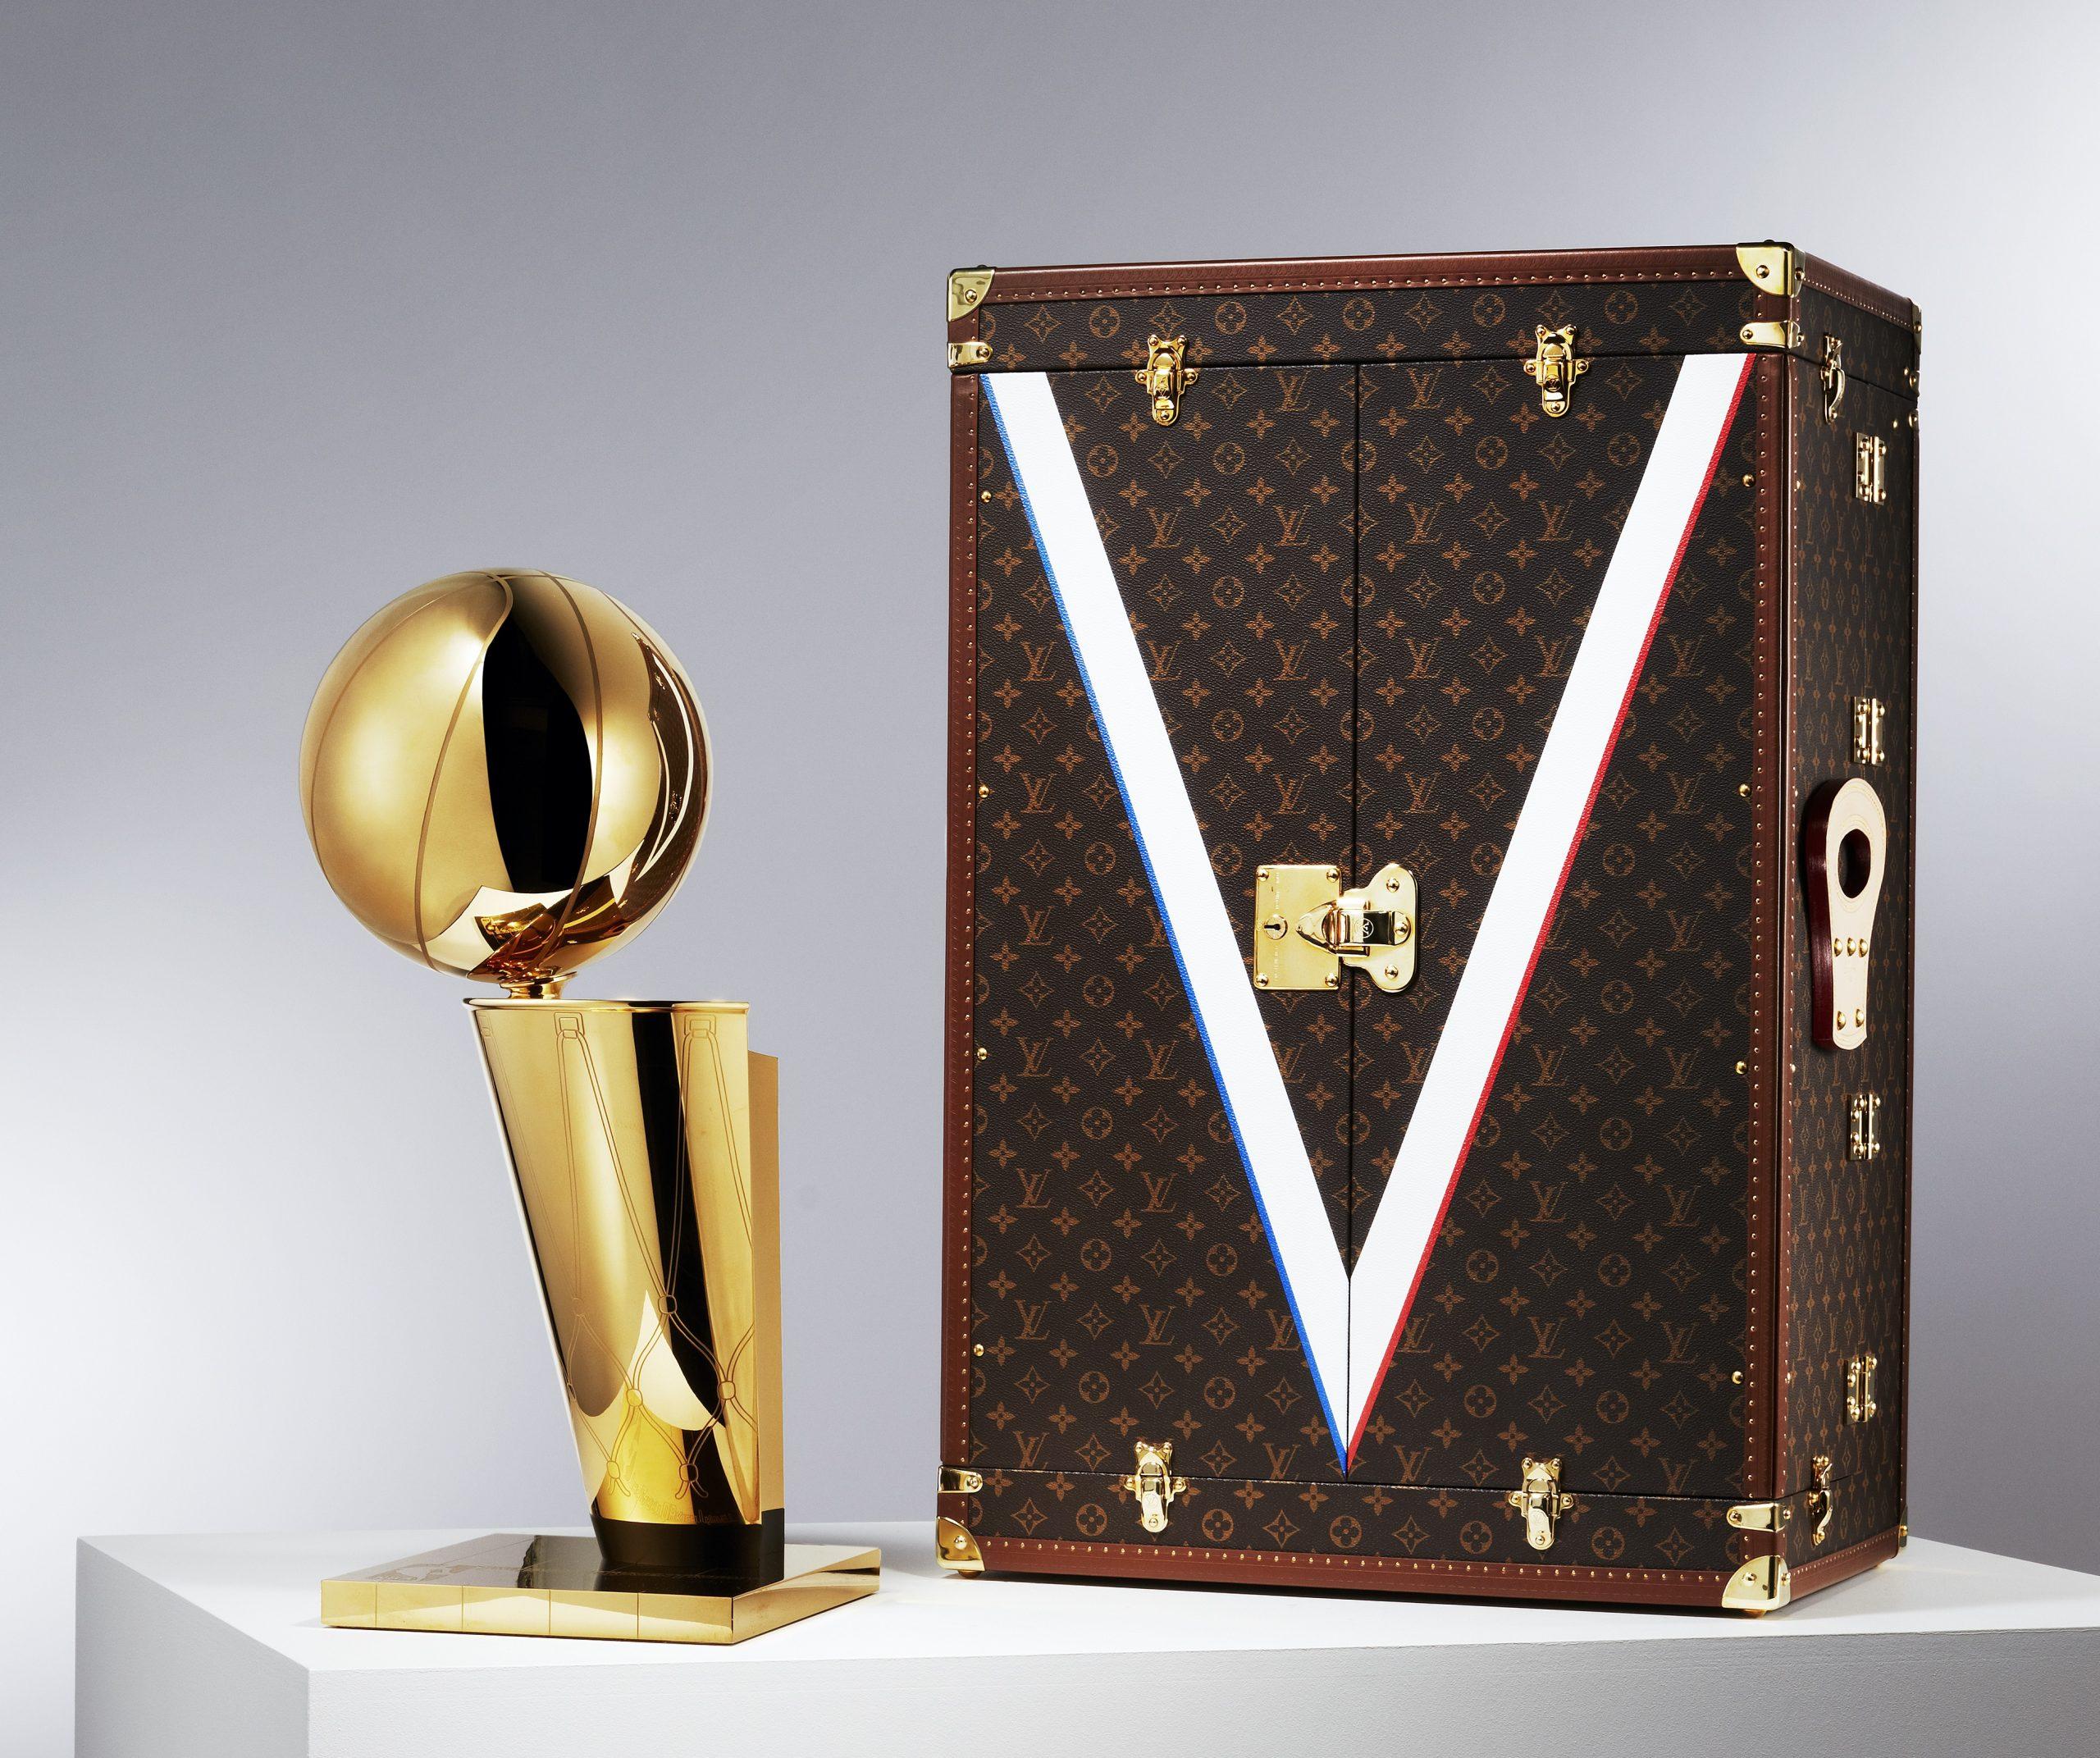 Louis Vuittton & NBA Announce Global Partnership